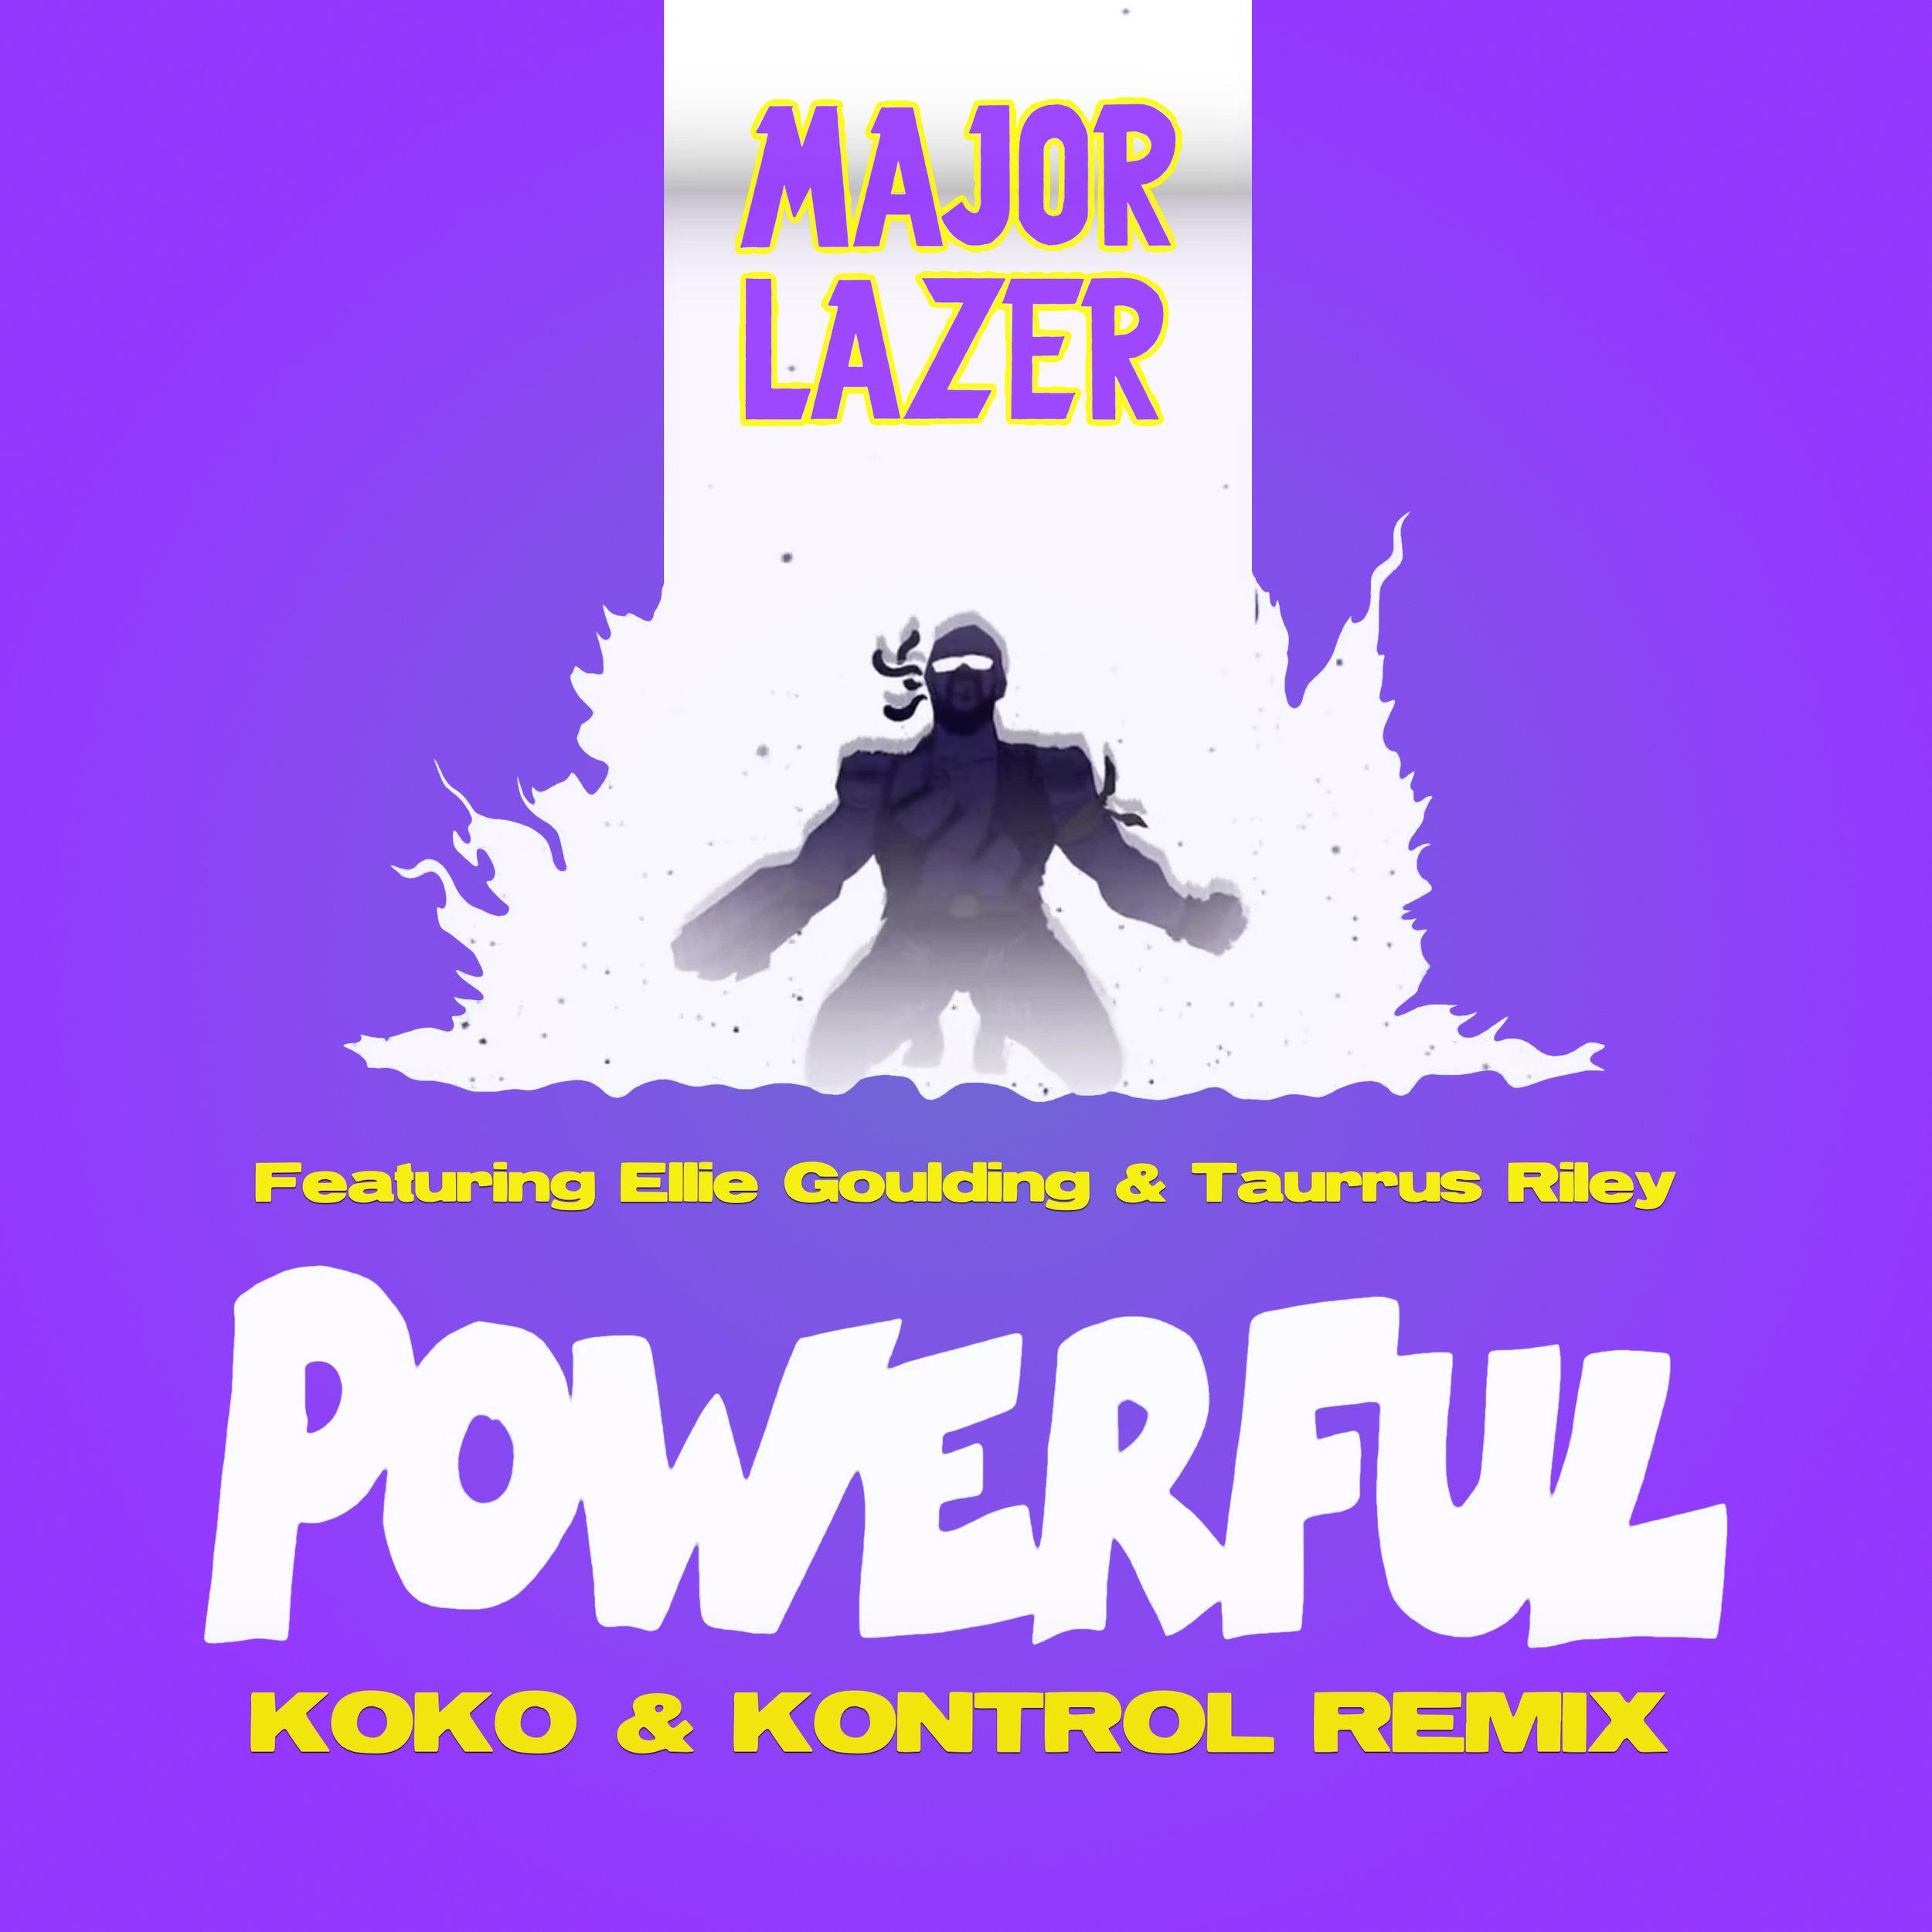 Major Lazer f. Ellie Goulding & Tarrus Riley - Powerful (KoKo & Kontrol Remix)